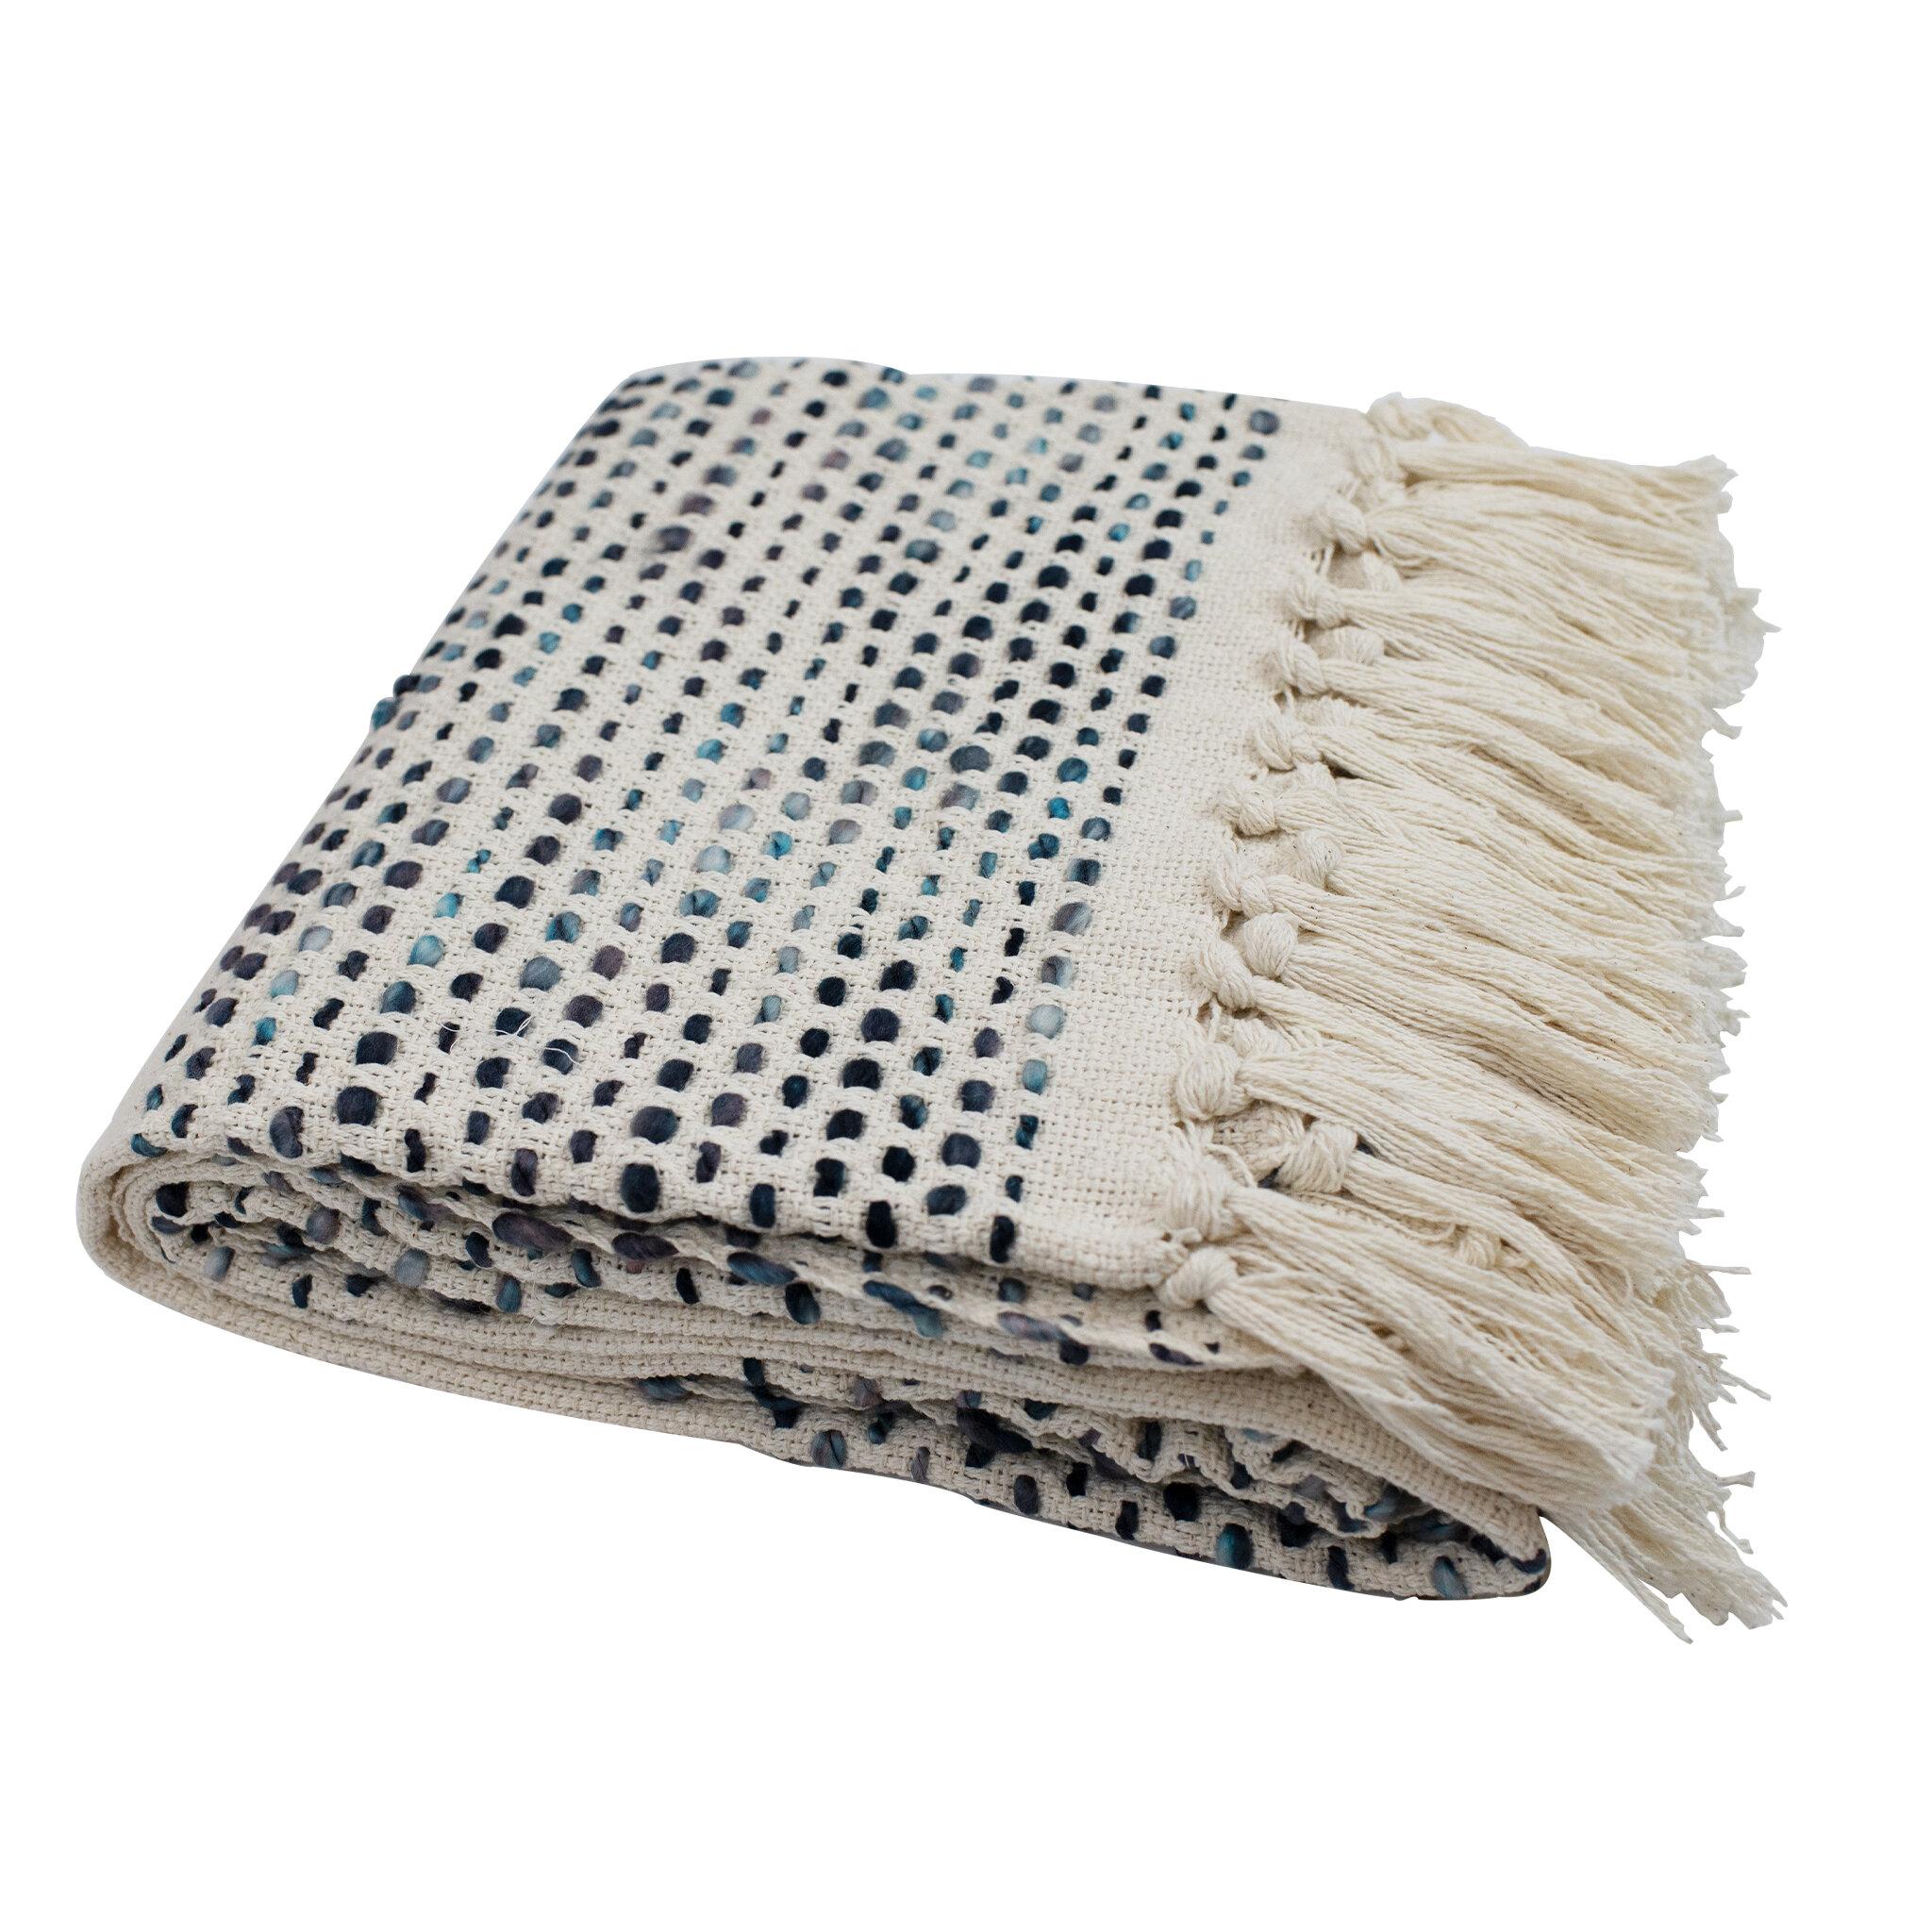 Polka Dot Woven Blankets Throws You Ll Love In 2021 Wayfair